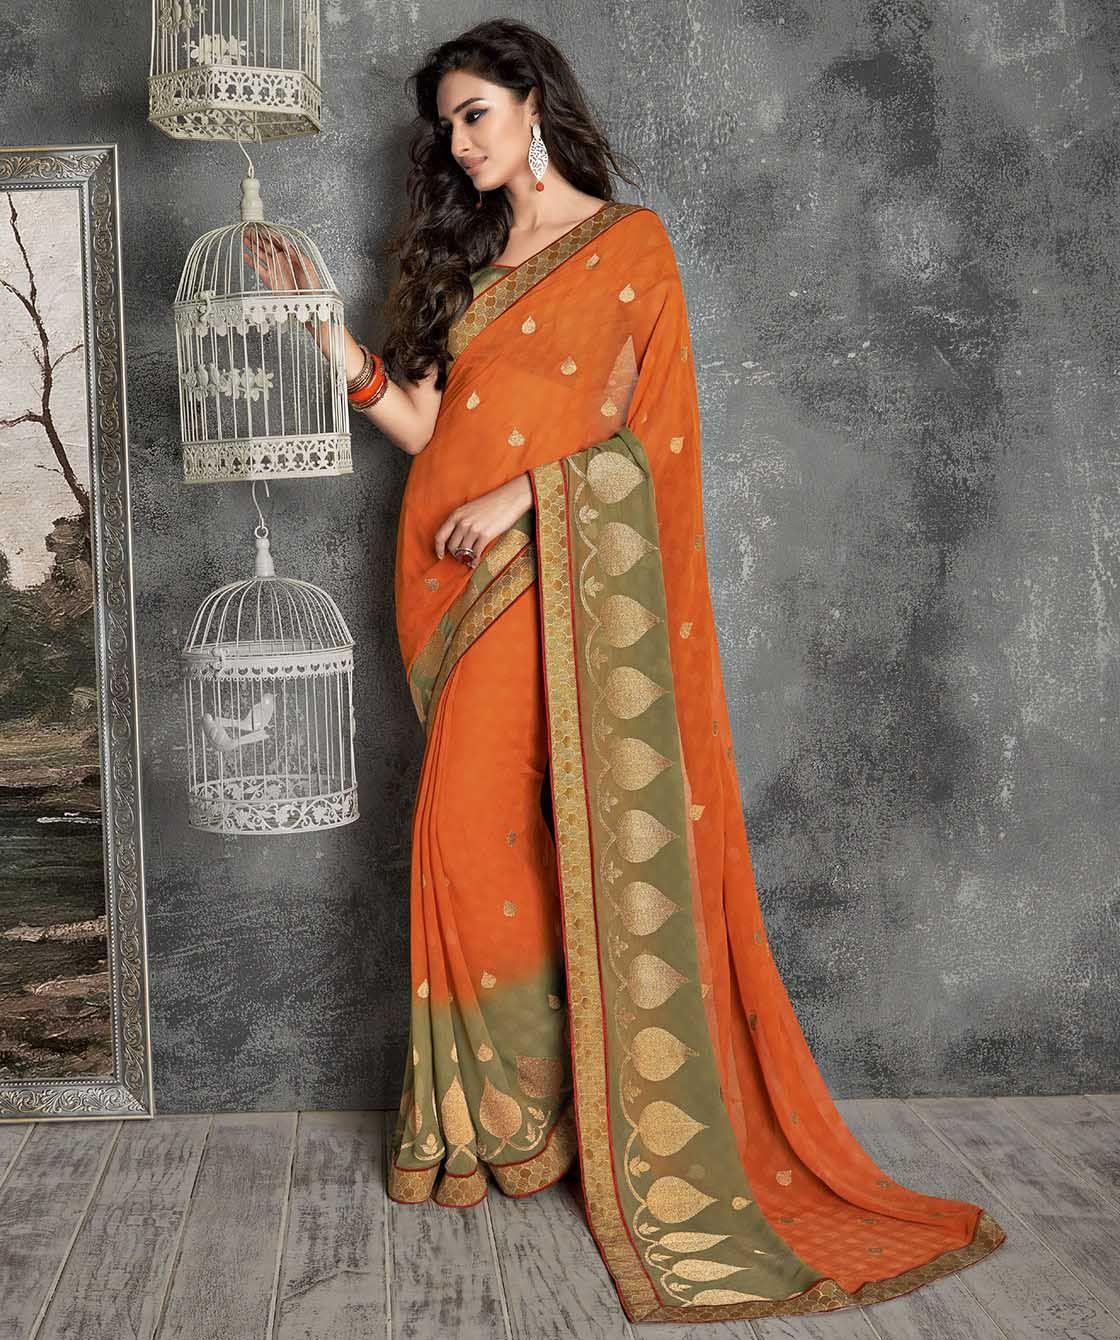 Saree blouse design for chiffon saree chiffon saree with blouse  saree orange copper rust brown